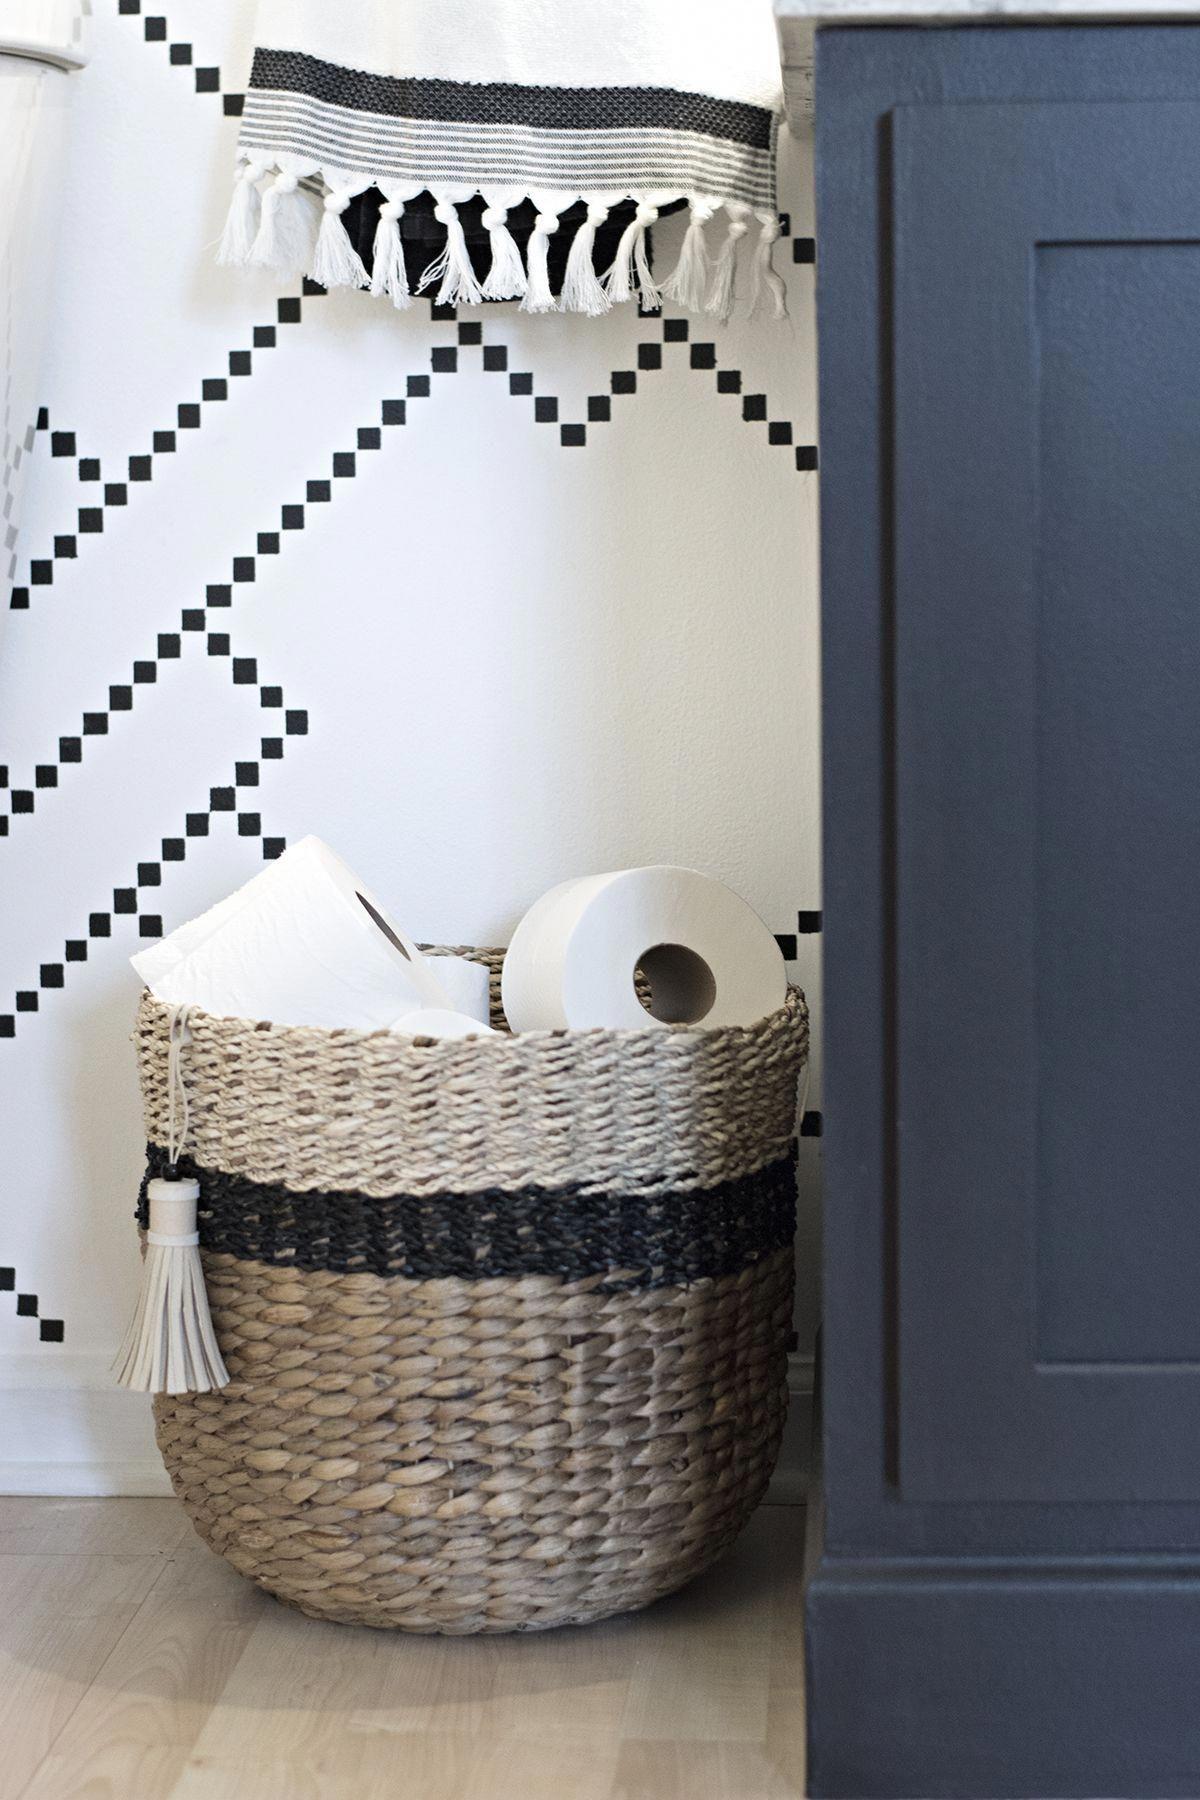 How To Arrange Your Bathroom Papieraufbewahrung Bad Korbe